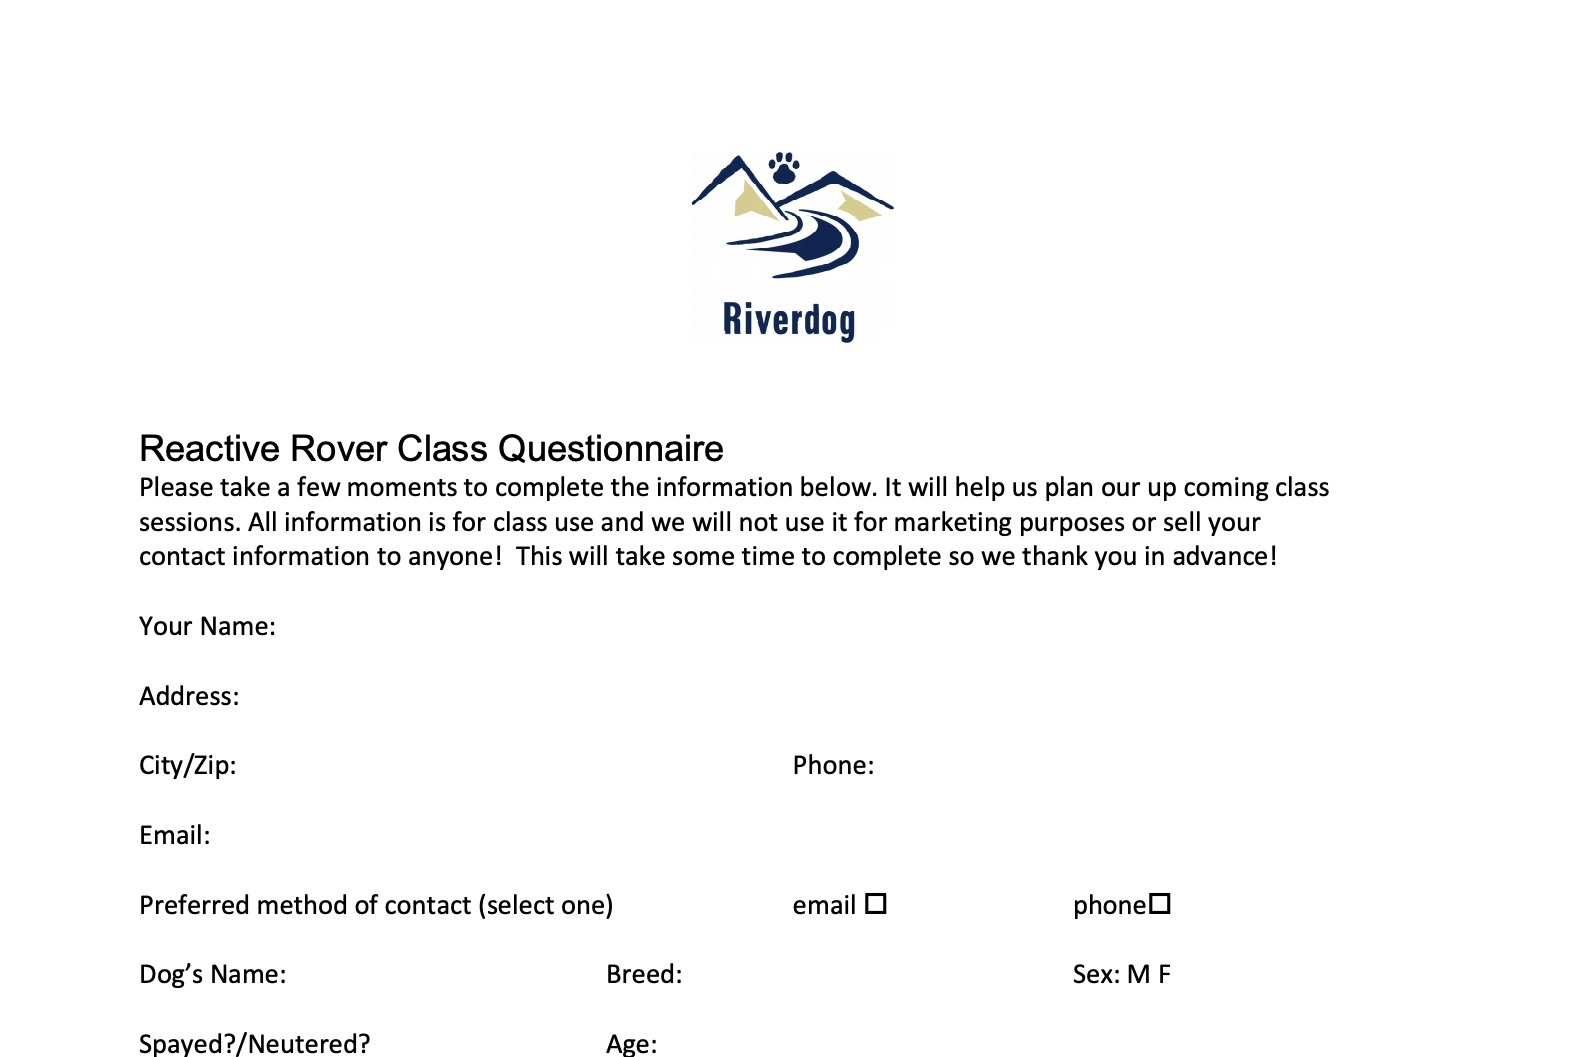 Reactive Rover Class Questionnaire -